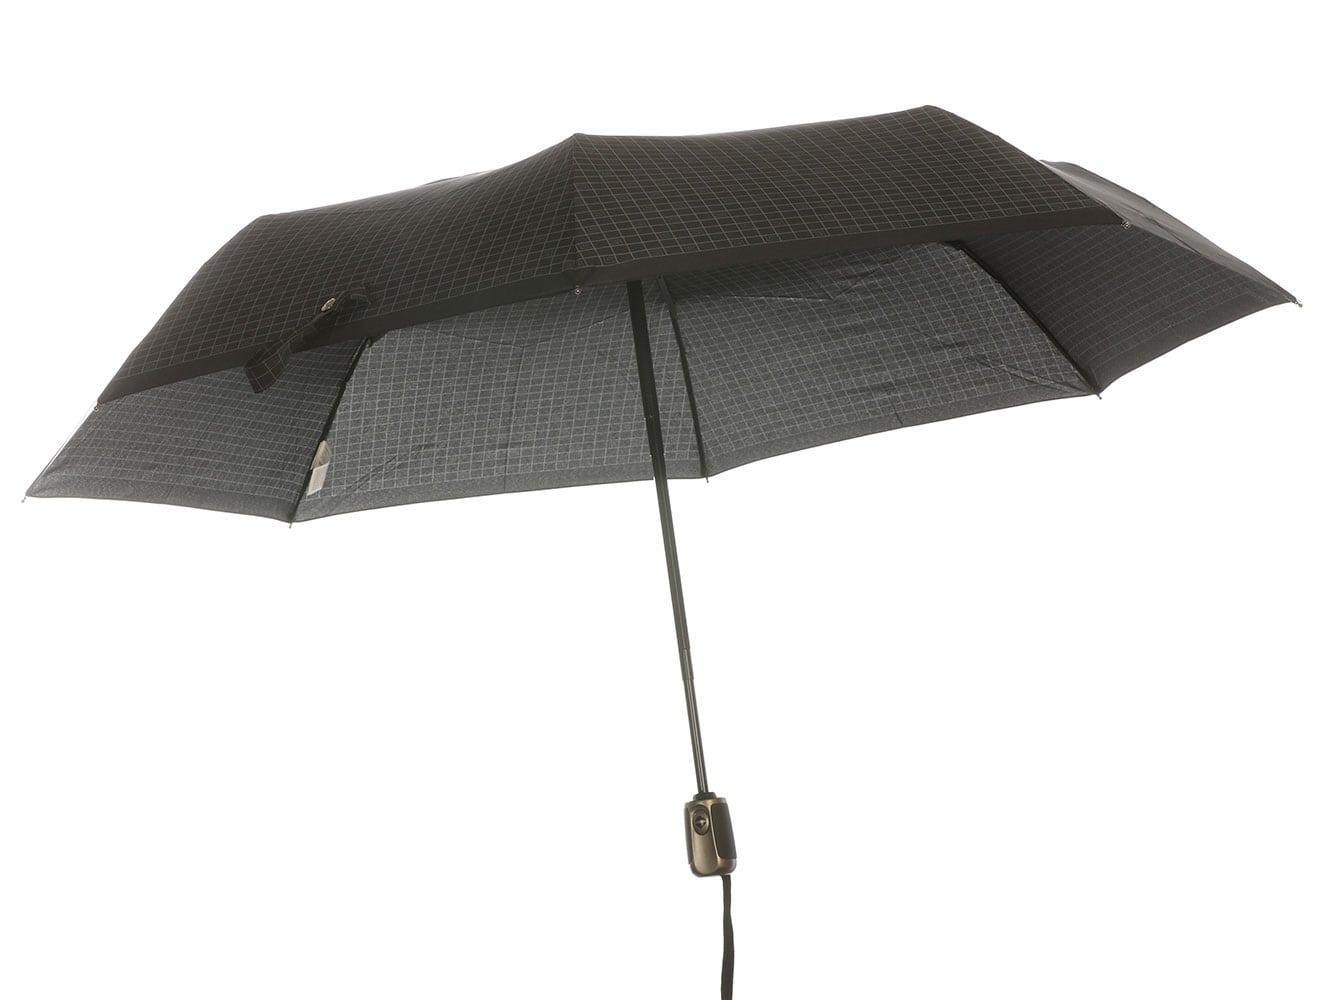 Guy Laroche 8131-01 ομπρέλα σπαστή αντιανεμική αυτόματο άνοιγμα κλείσιμο μαύρο